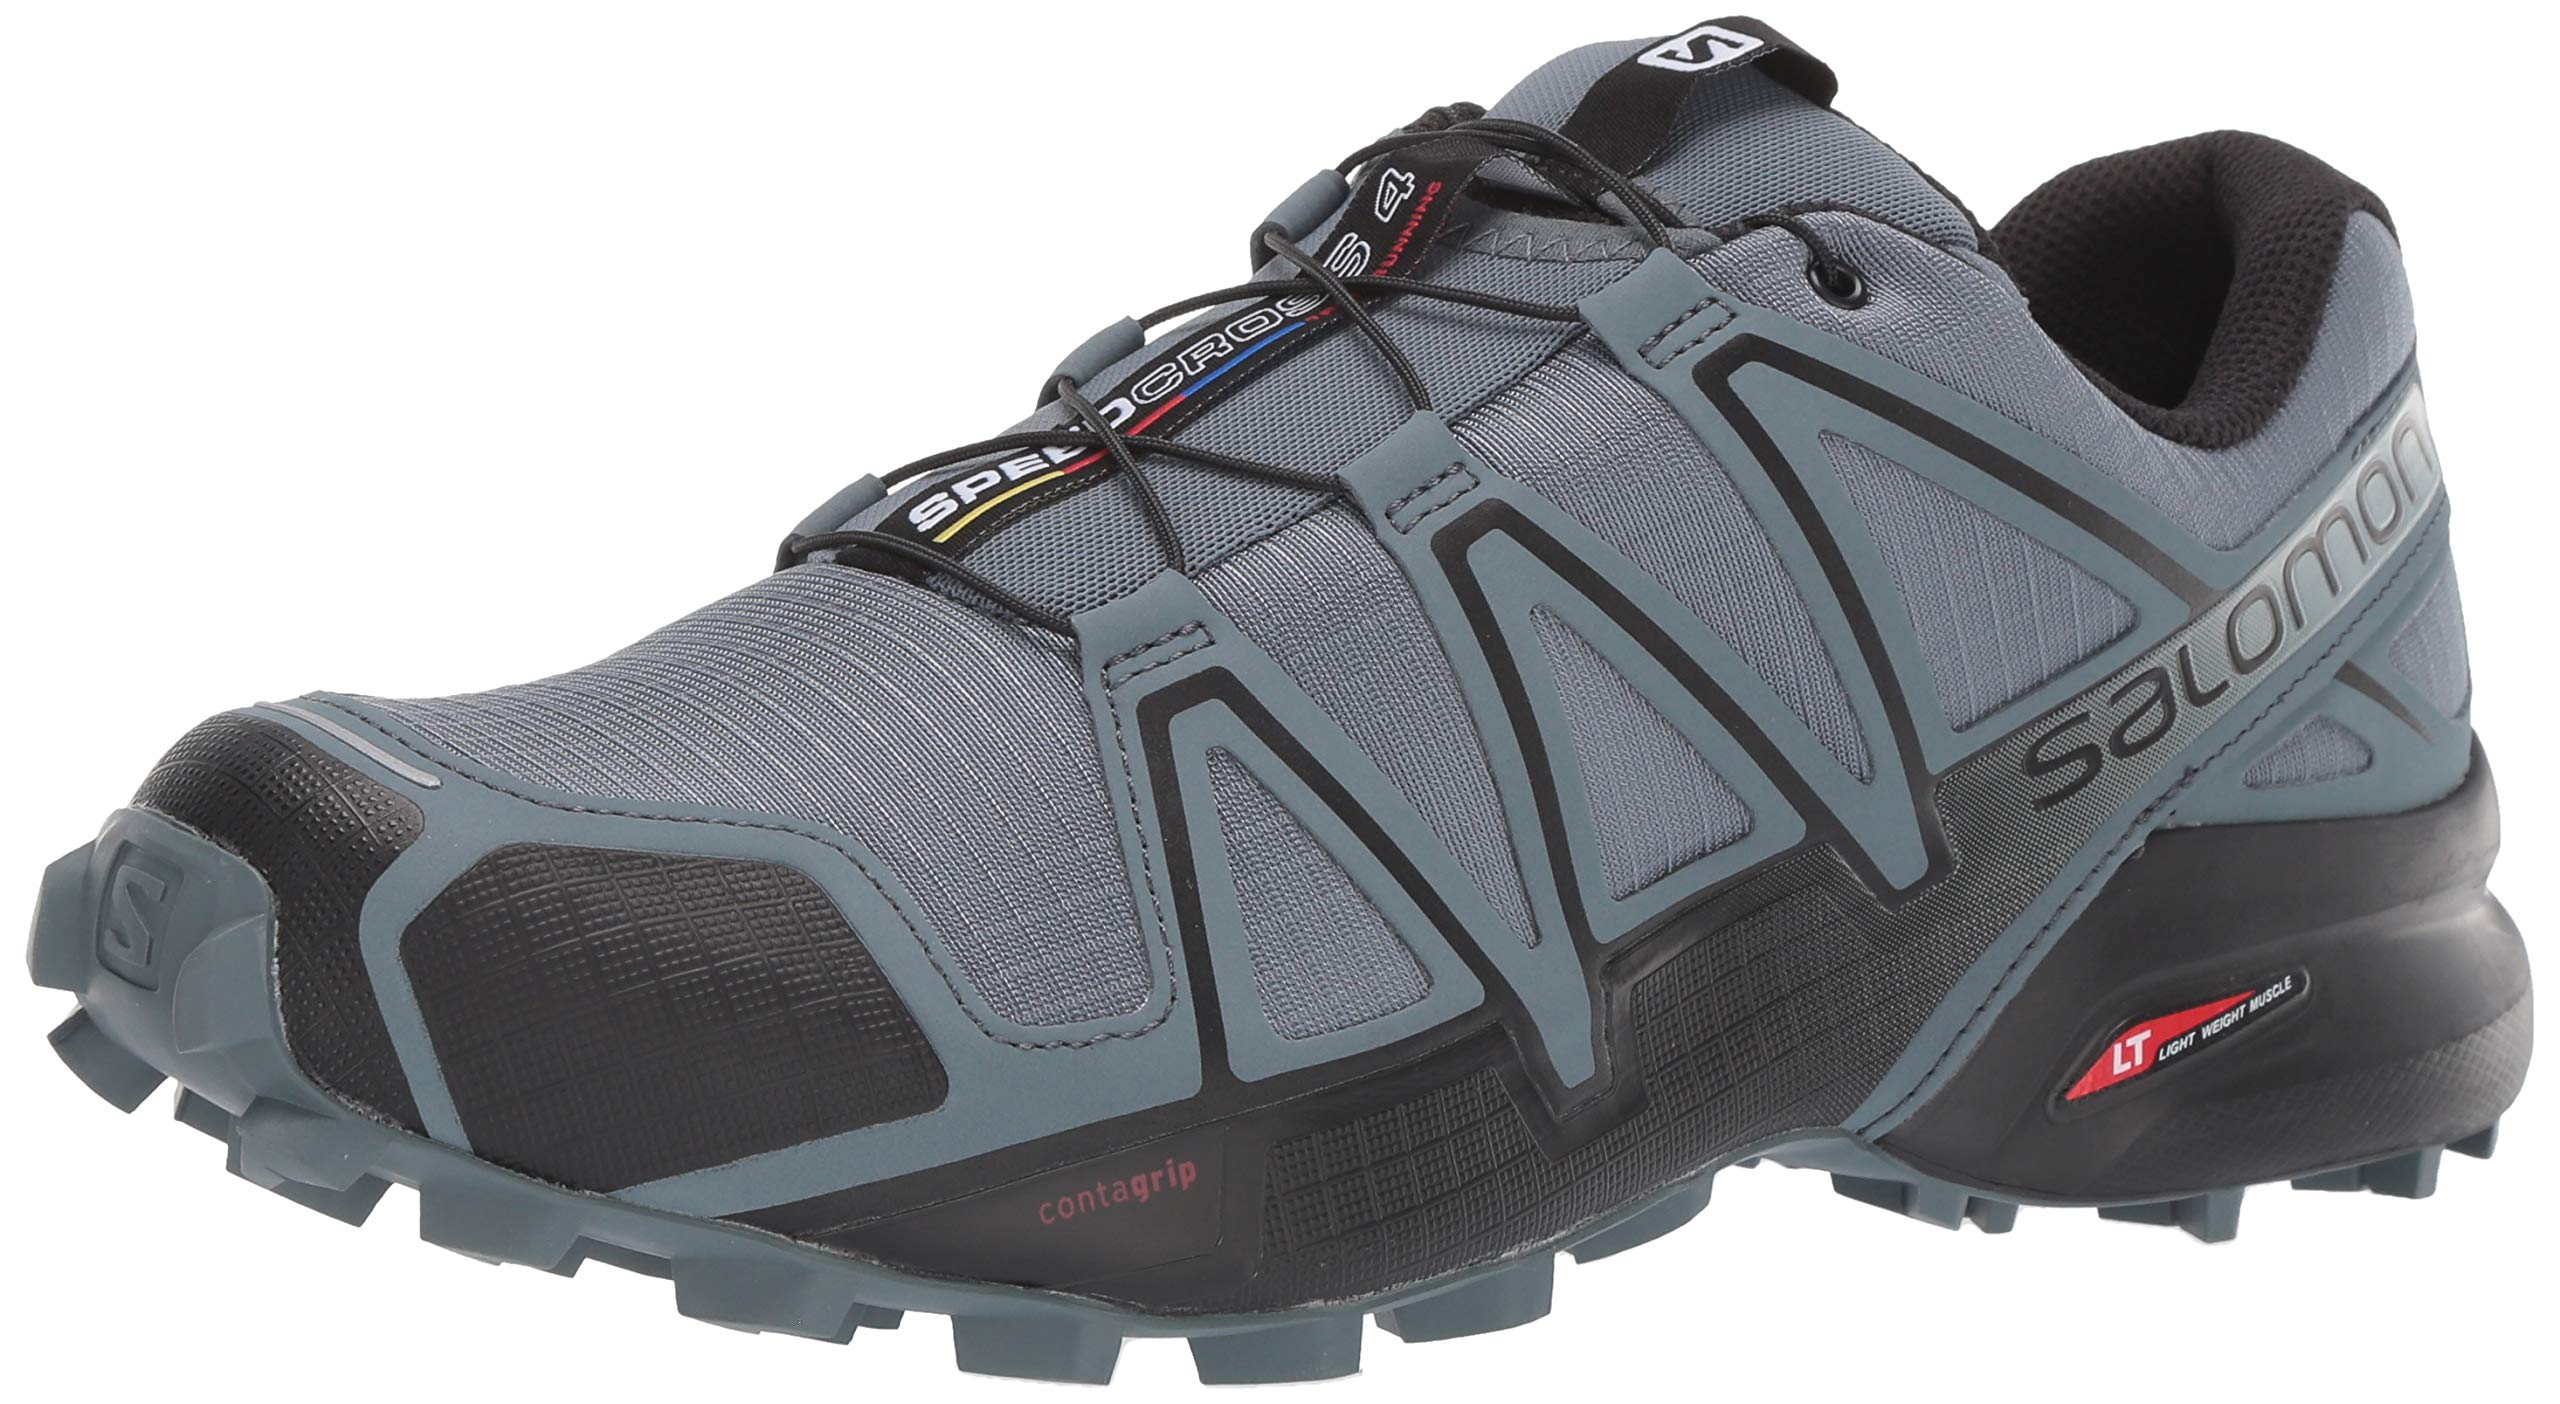 SALOMON Speedcross 4, Scarpe da Trail Running Uomo 6 spesavip